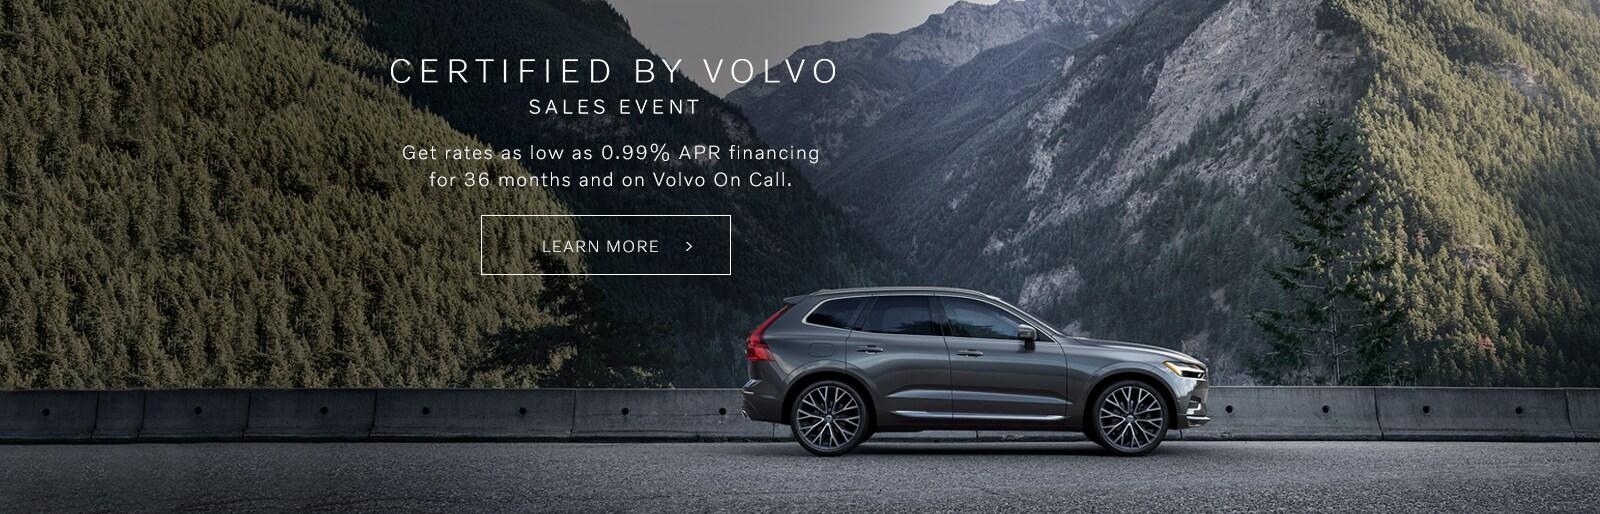 Ken Garff Volvo Cars | New Volvo and Used Car Dealer in Salt Lake